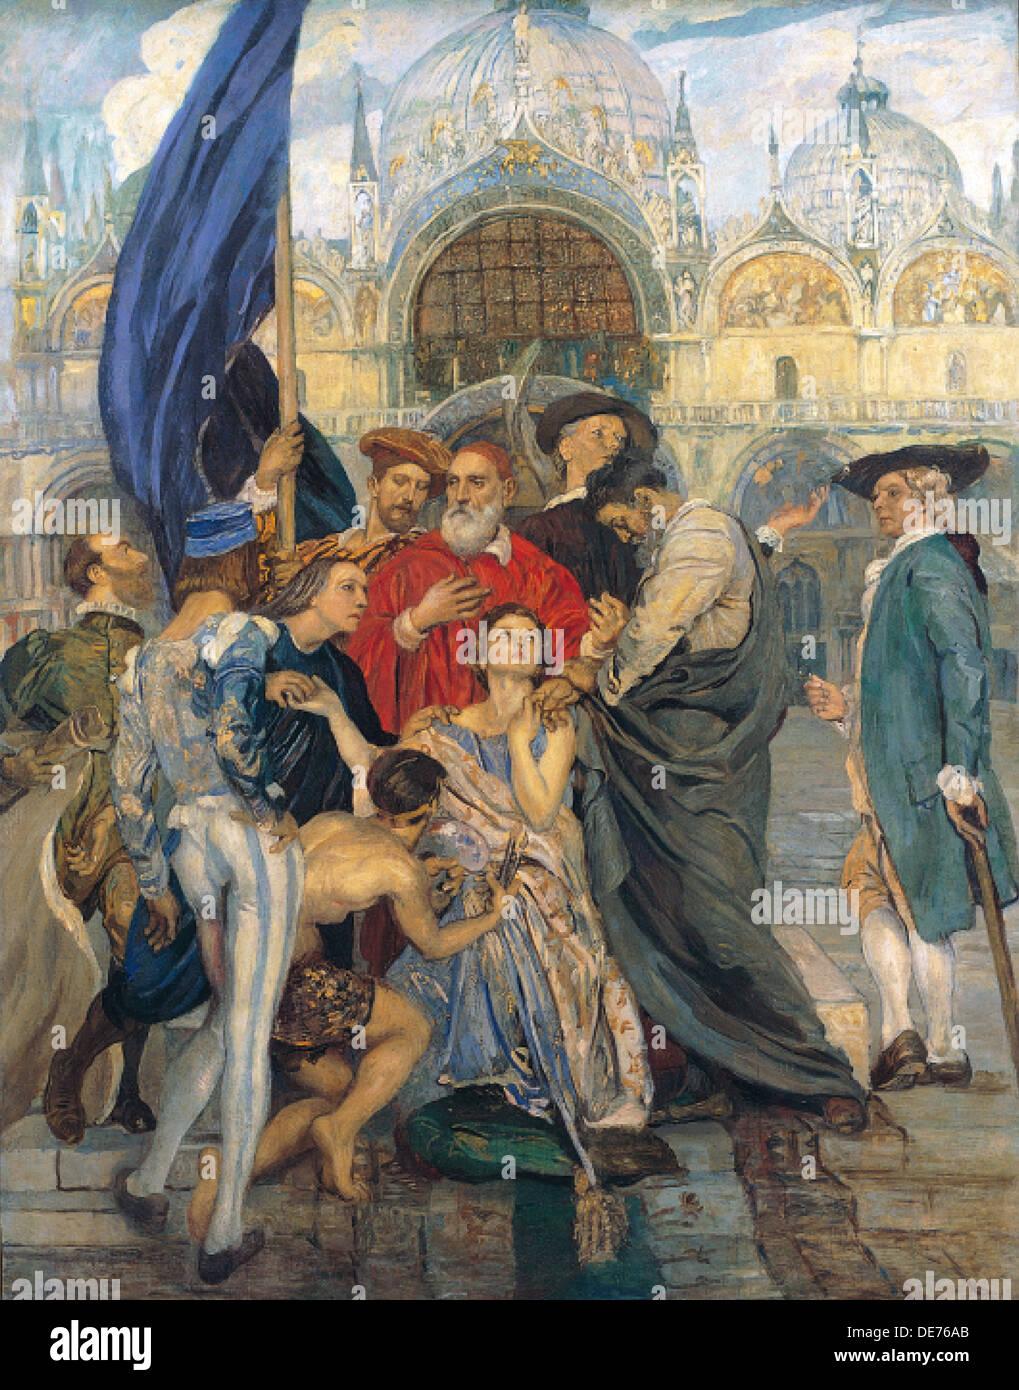 Die venezianischen Maler, 1937. Künstler: Tito, Ettore (1859-1941) Stockbild